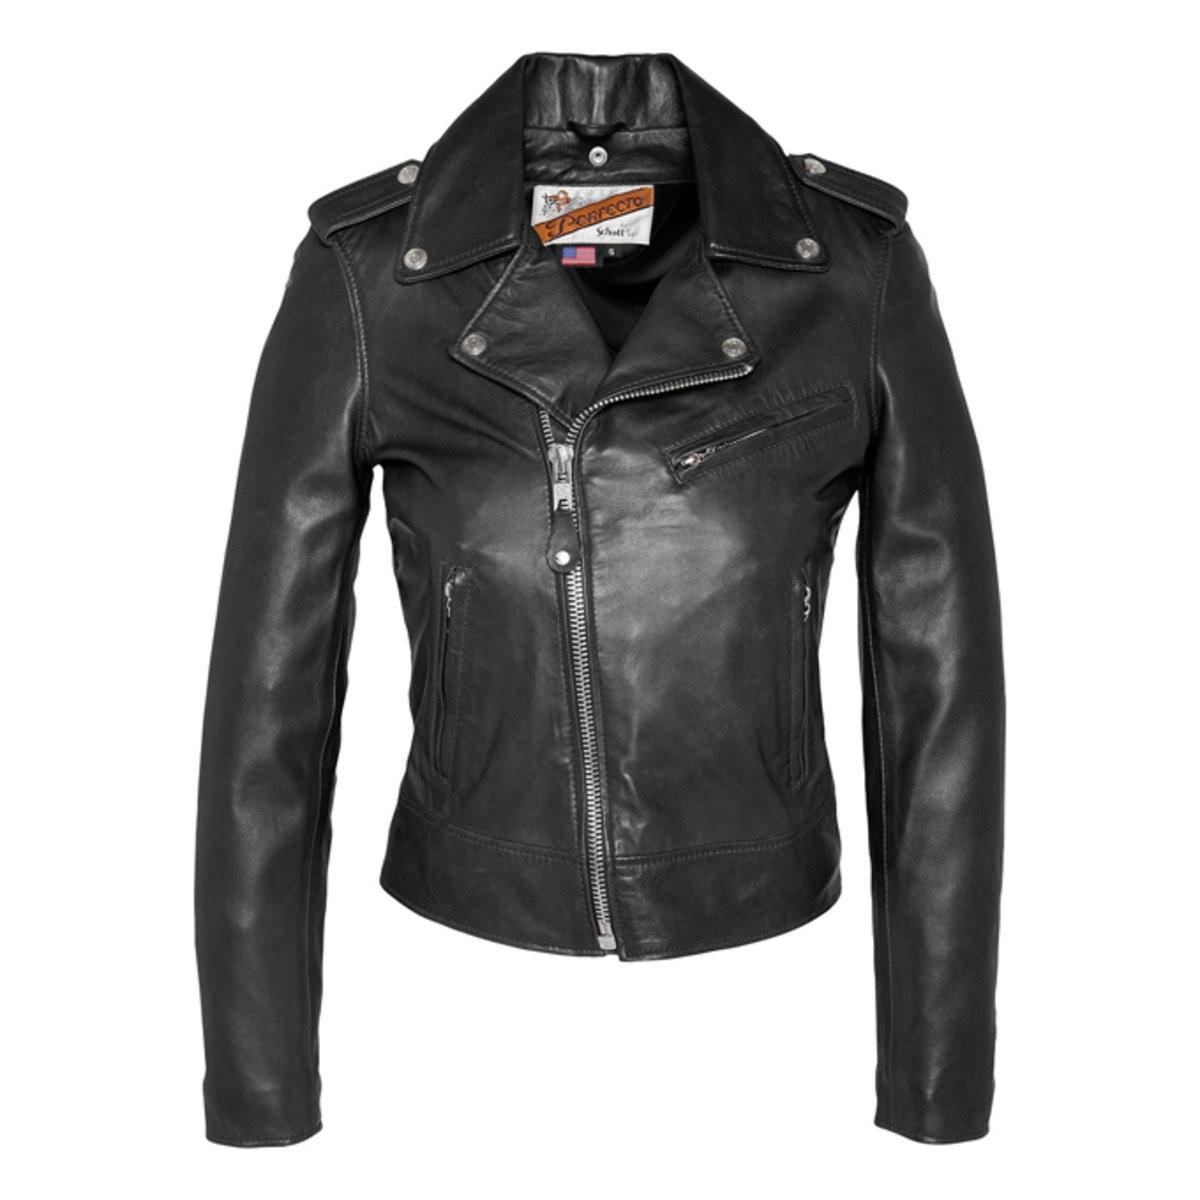 Блузон La Redoute Из кожи ягненка LCW D XL черный блузон